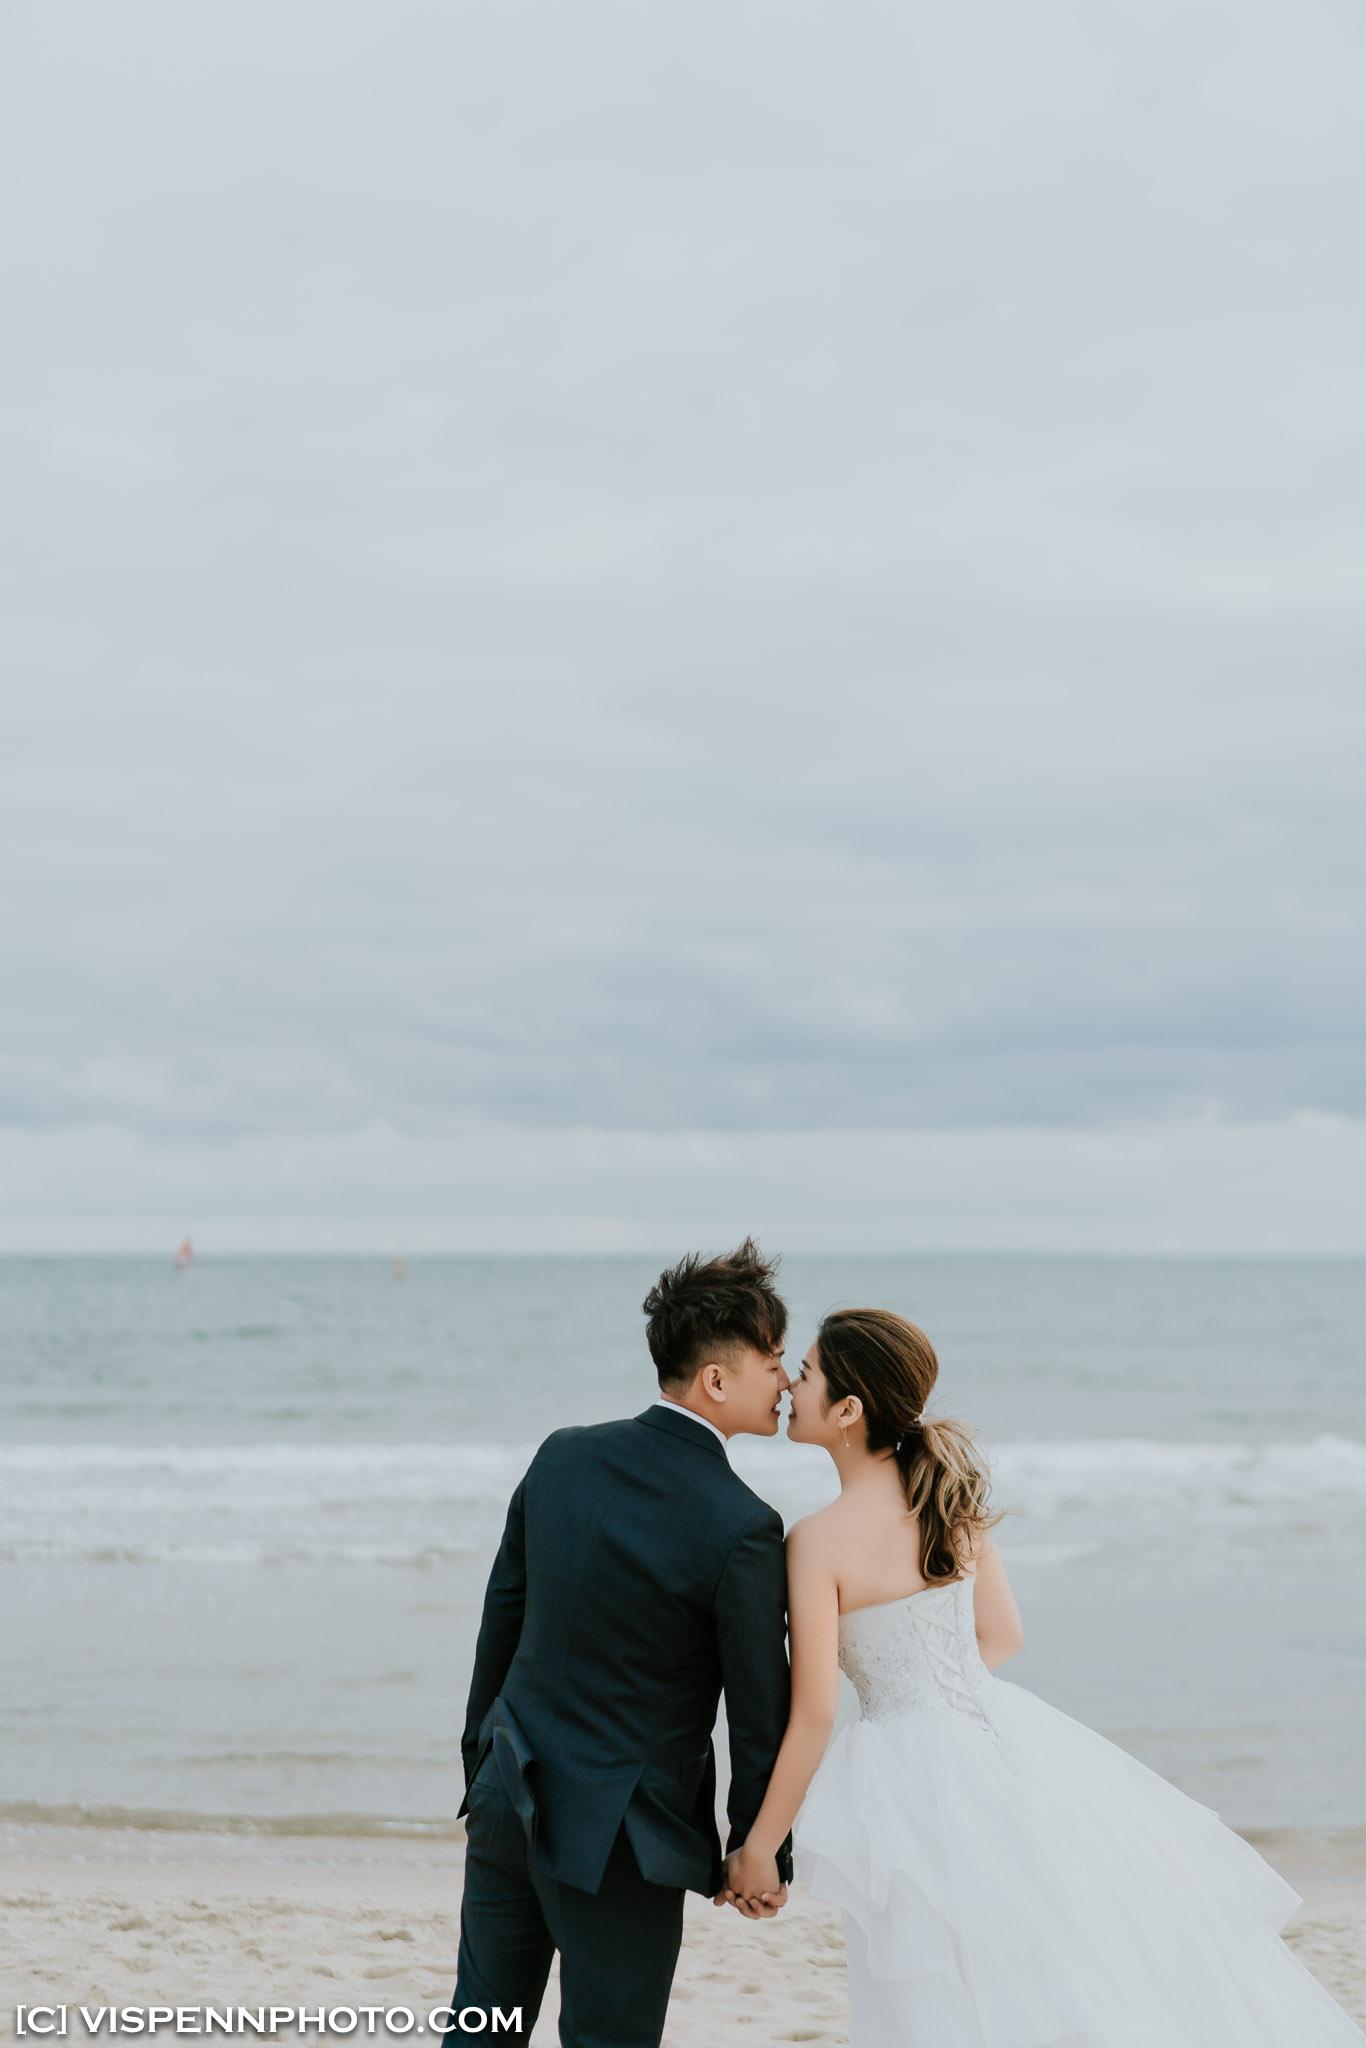 PRE WEDDING Photography Melbourne VISPENN 墨尔本 婚纱照 结婚照 婚纱摄影 GiGi 3017 A7R3 VISPENN